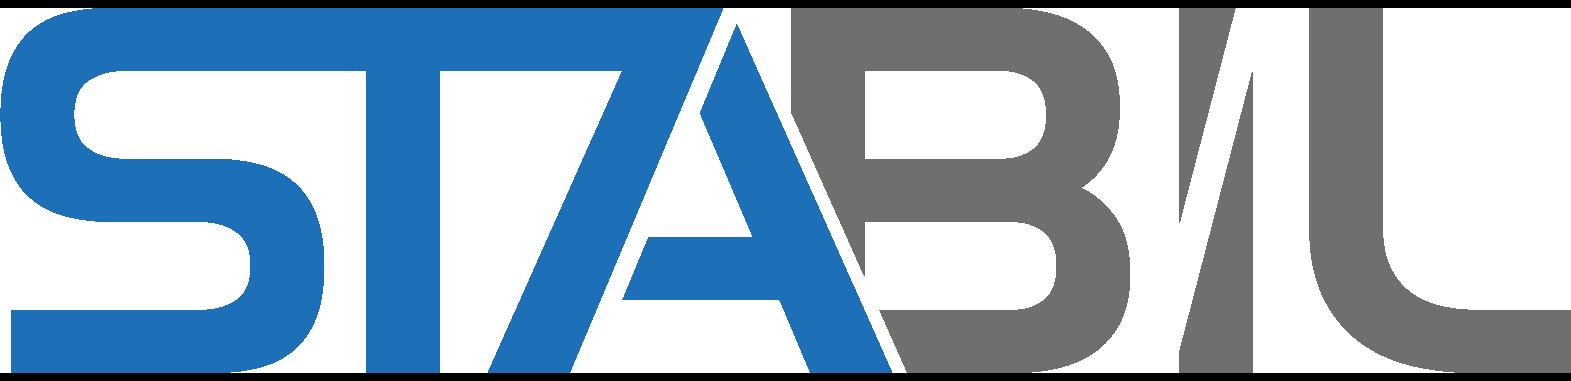 STABIL – Stark durch Bildung Logo